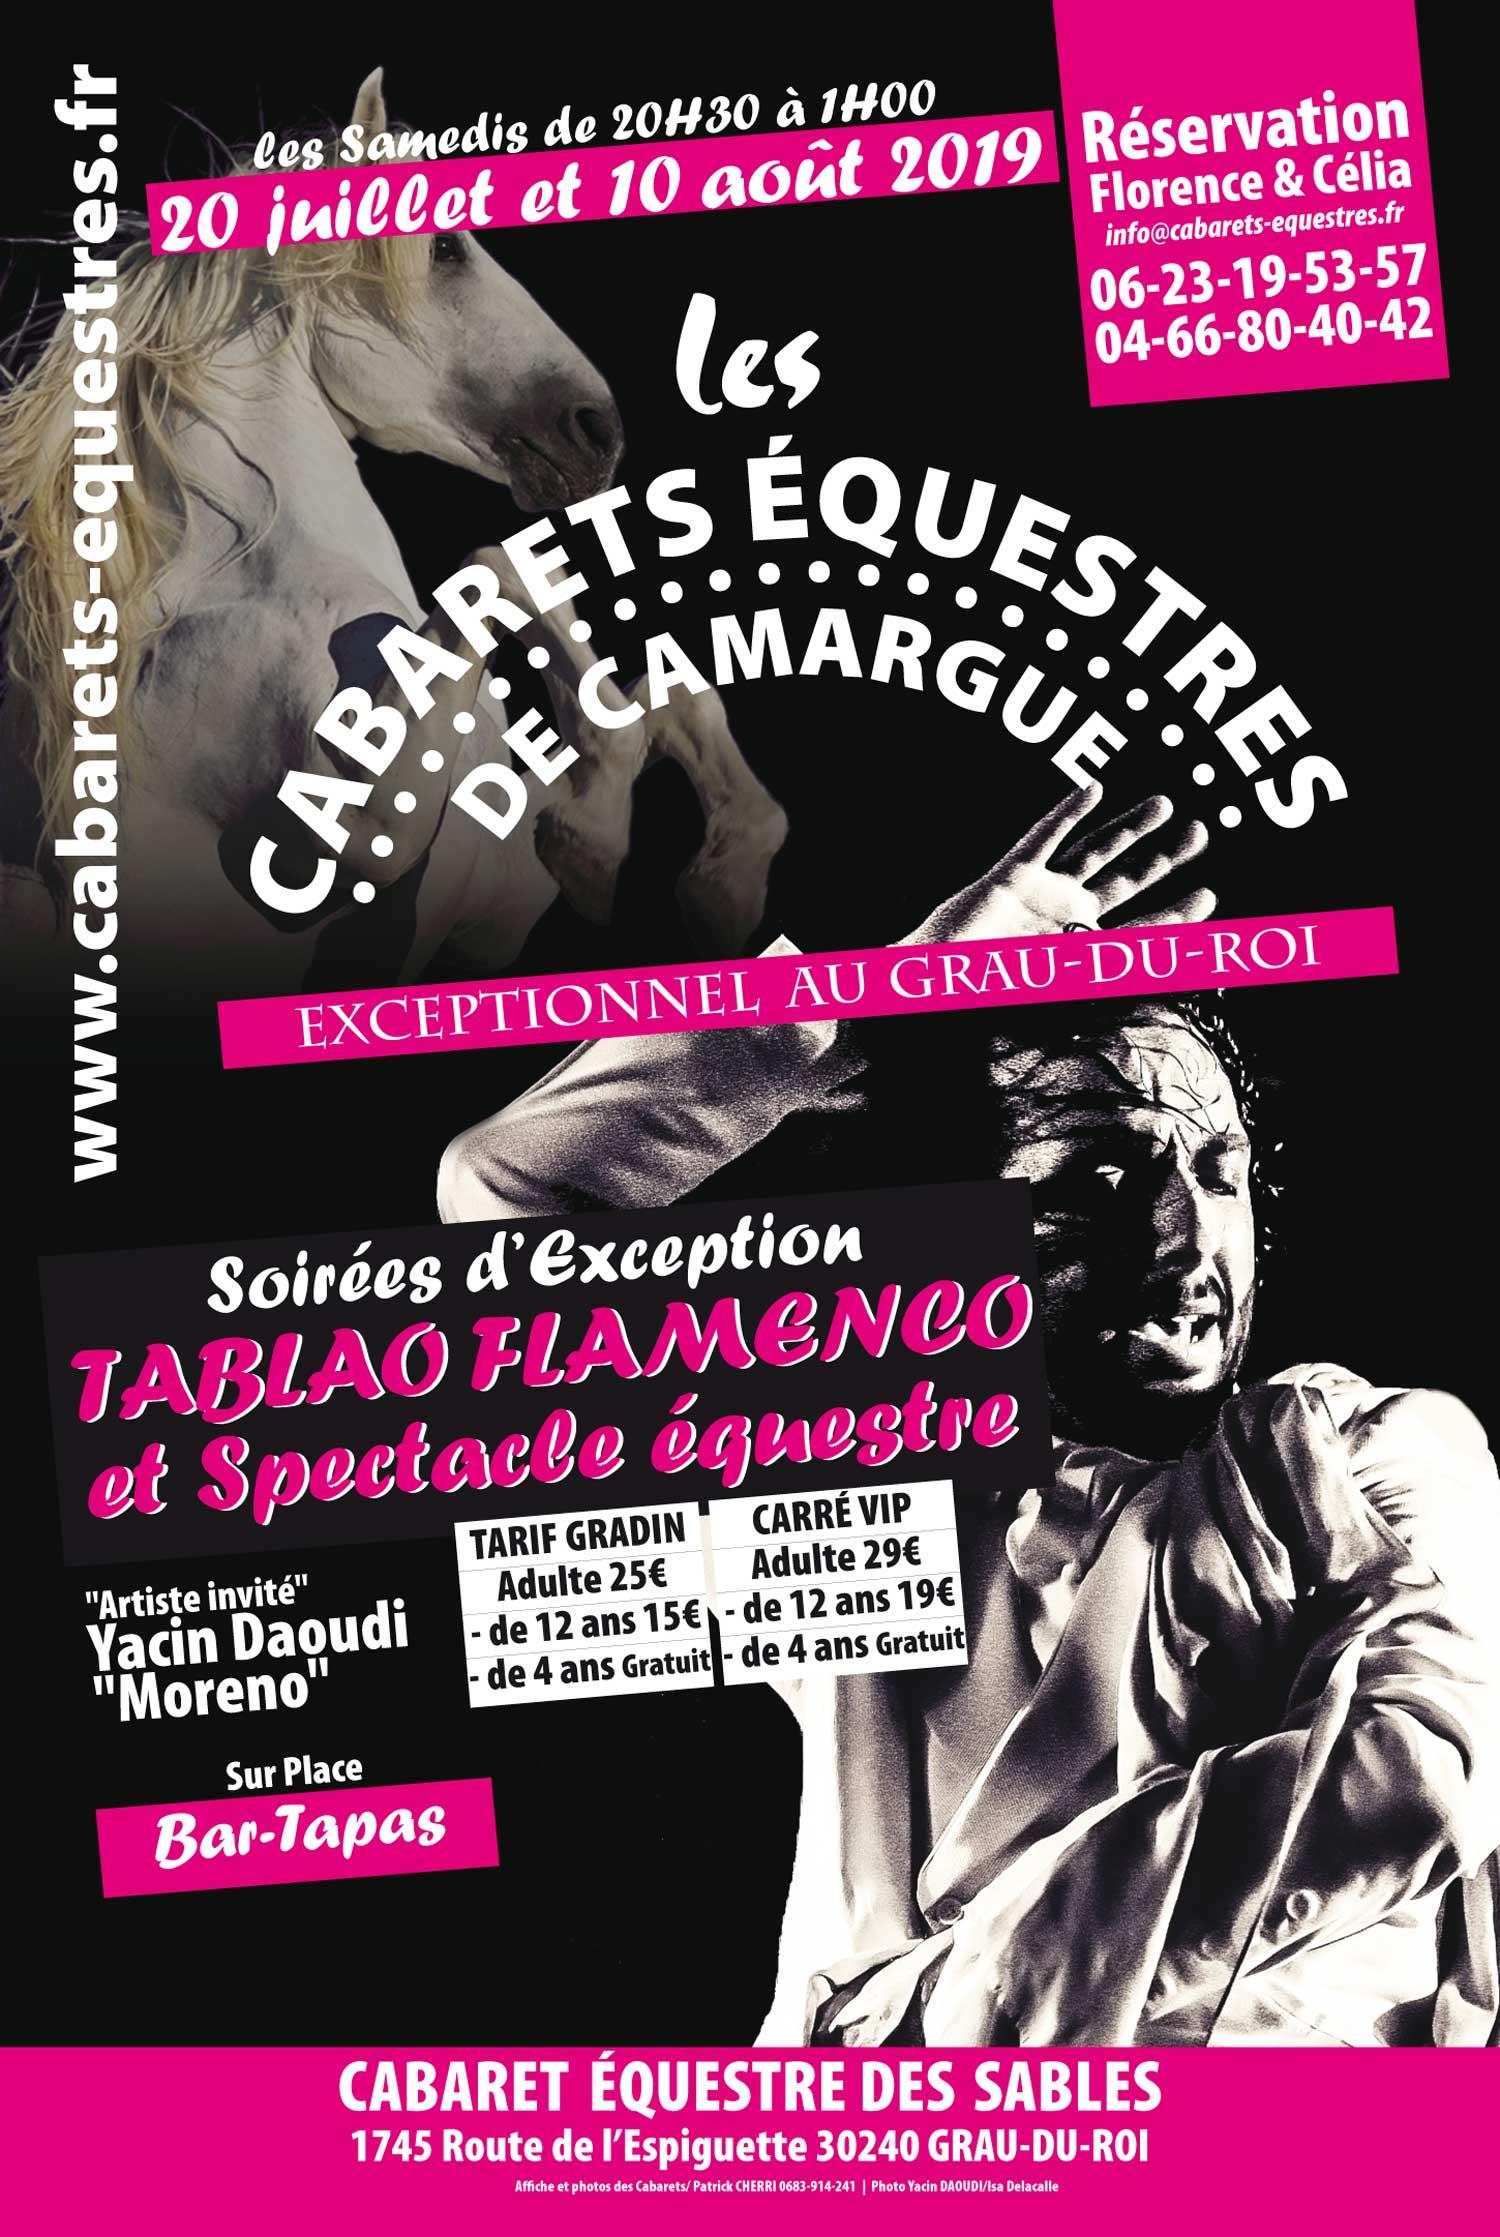 restaurant, soirée camarguaise, cabaret-equestres, flamenco, soirée gitane,